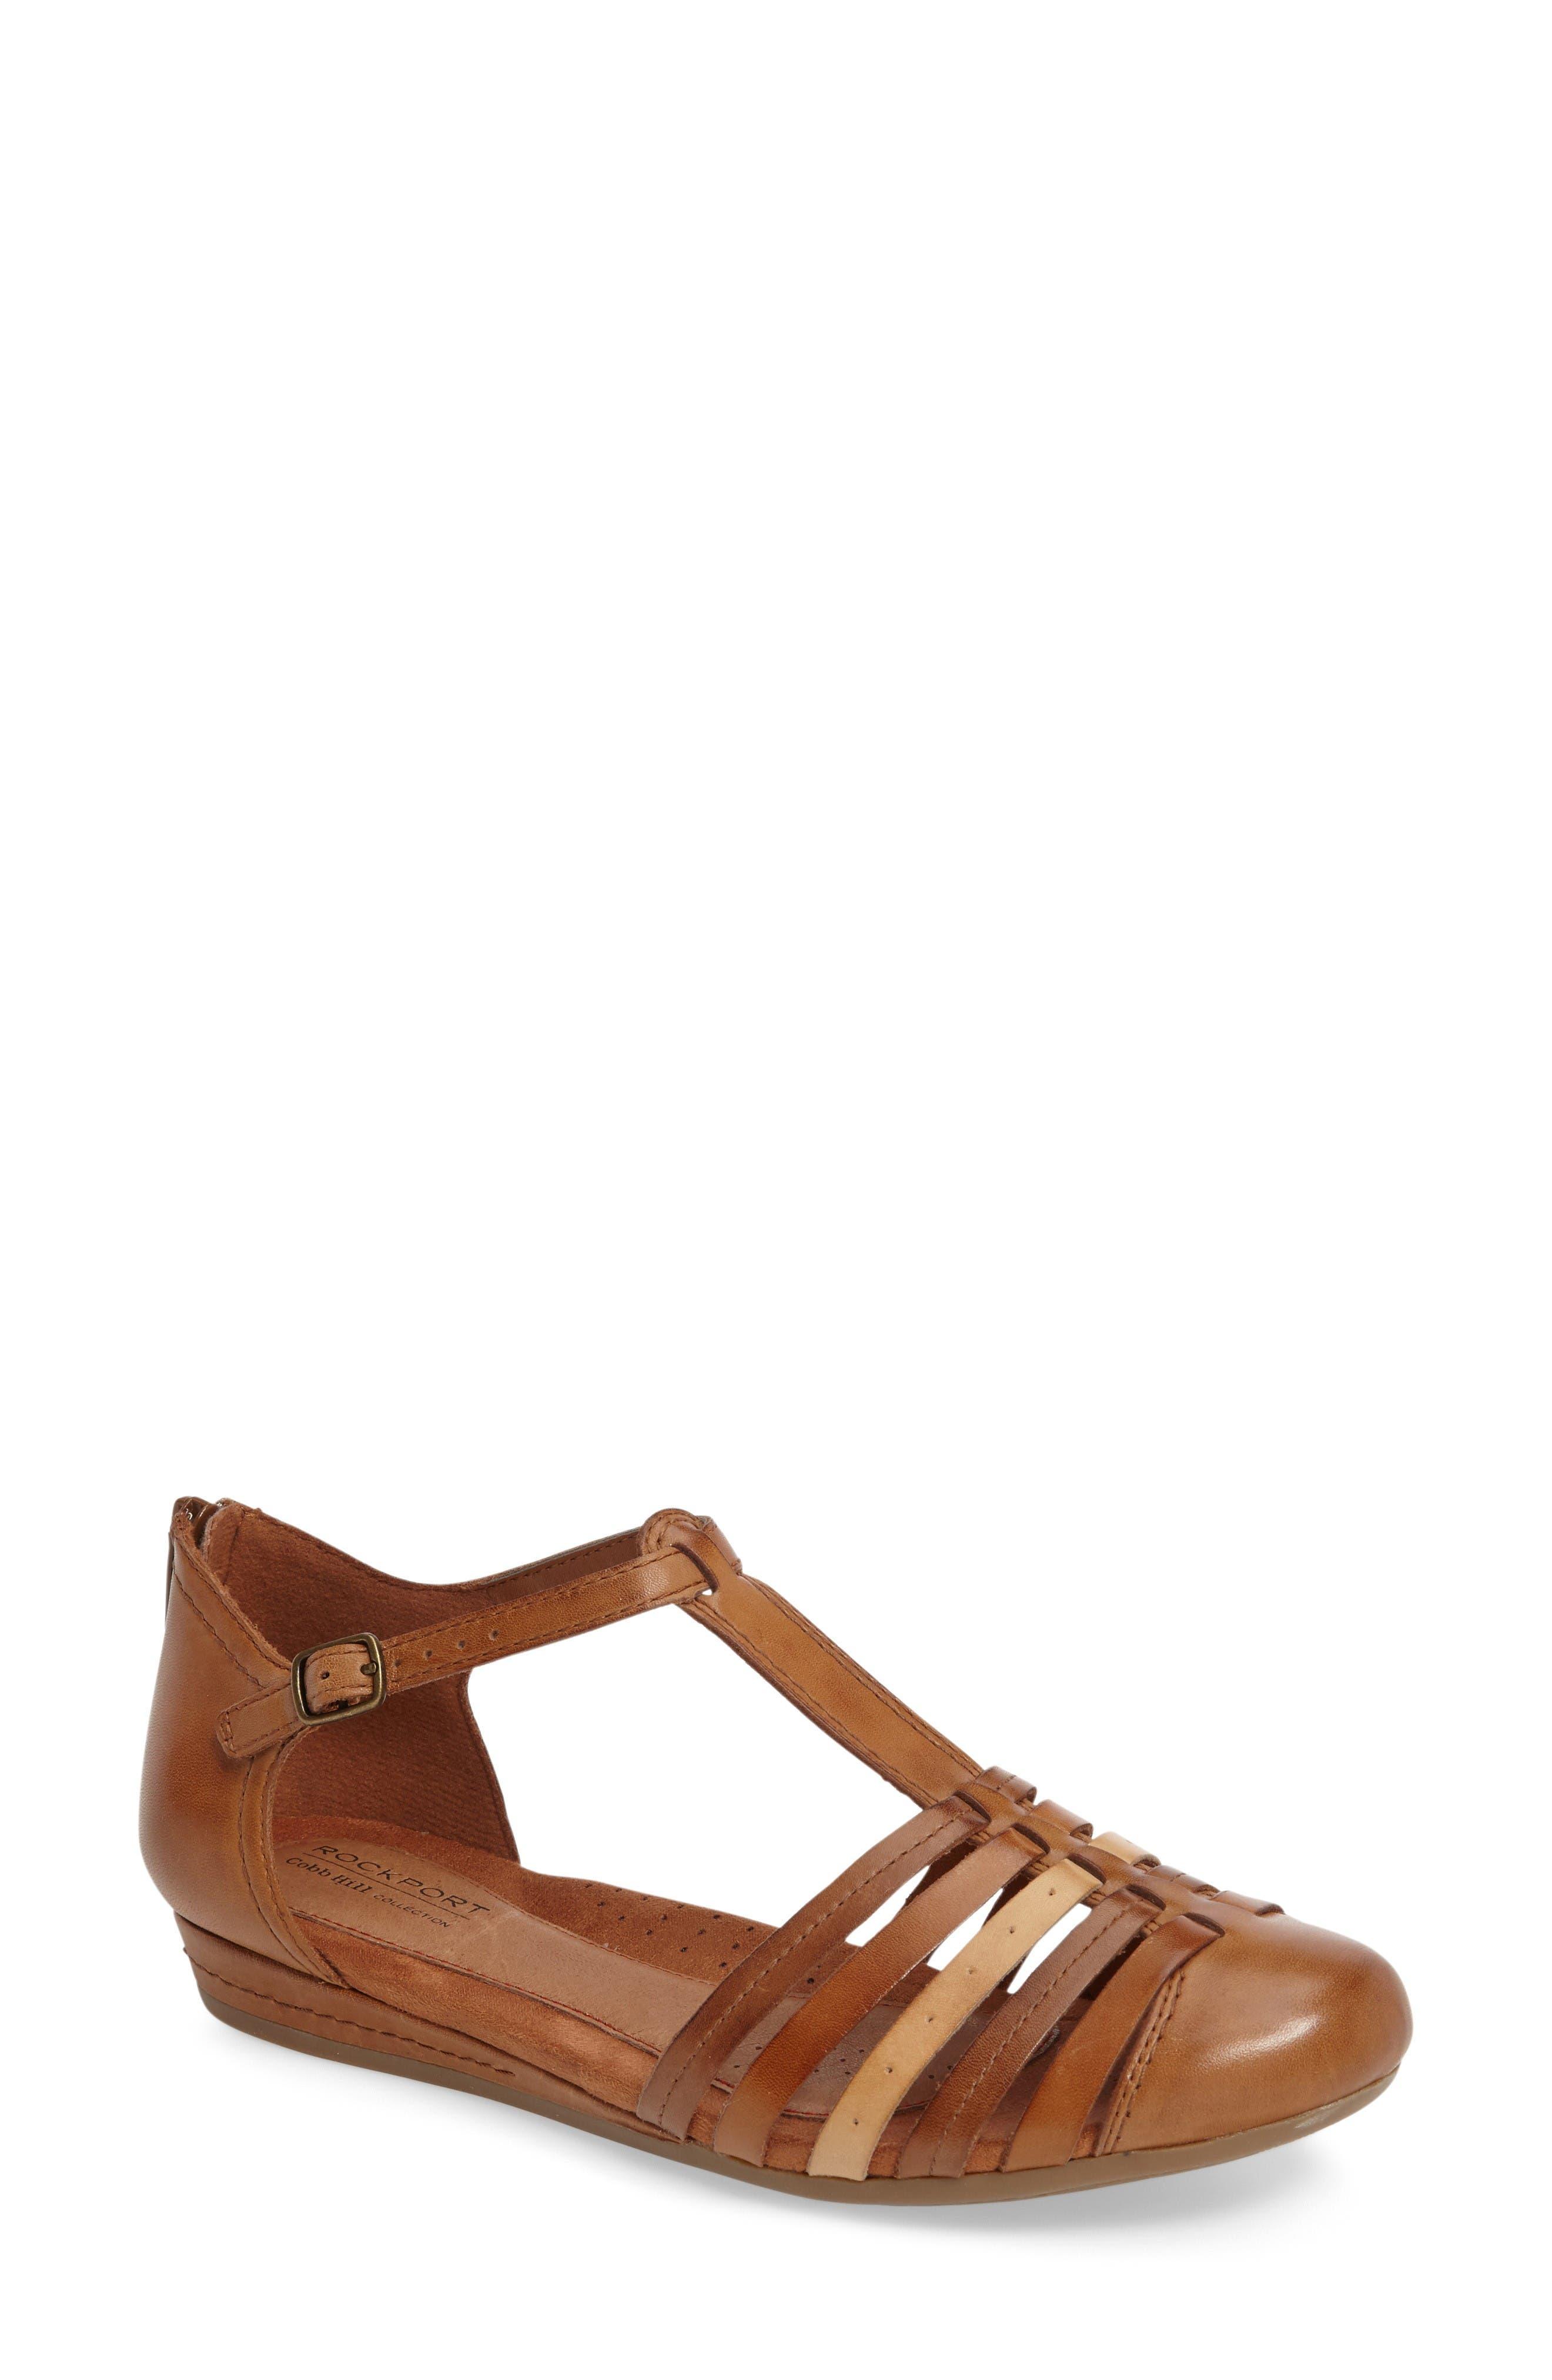 Main Image - Rockport Cobb Hill Galway T-Strap Sandal (Women)